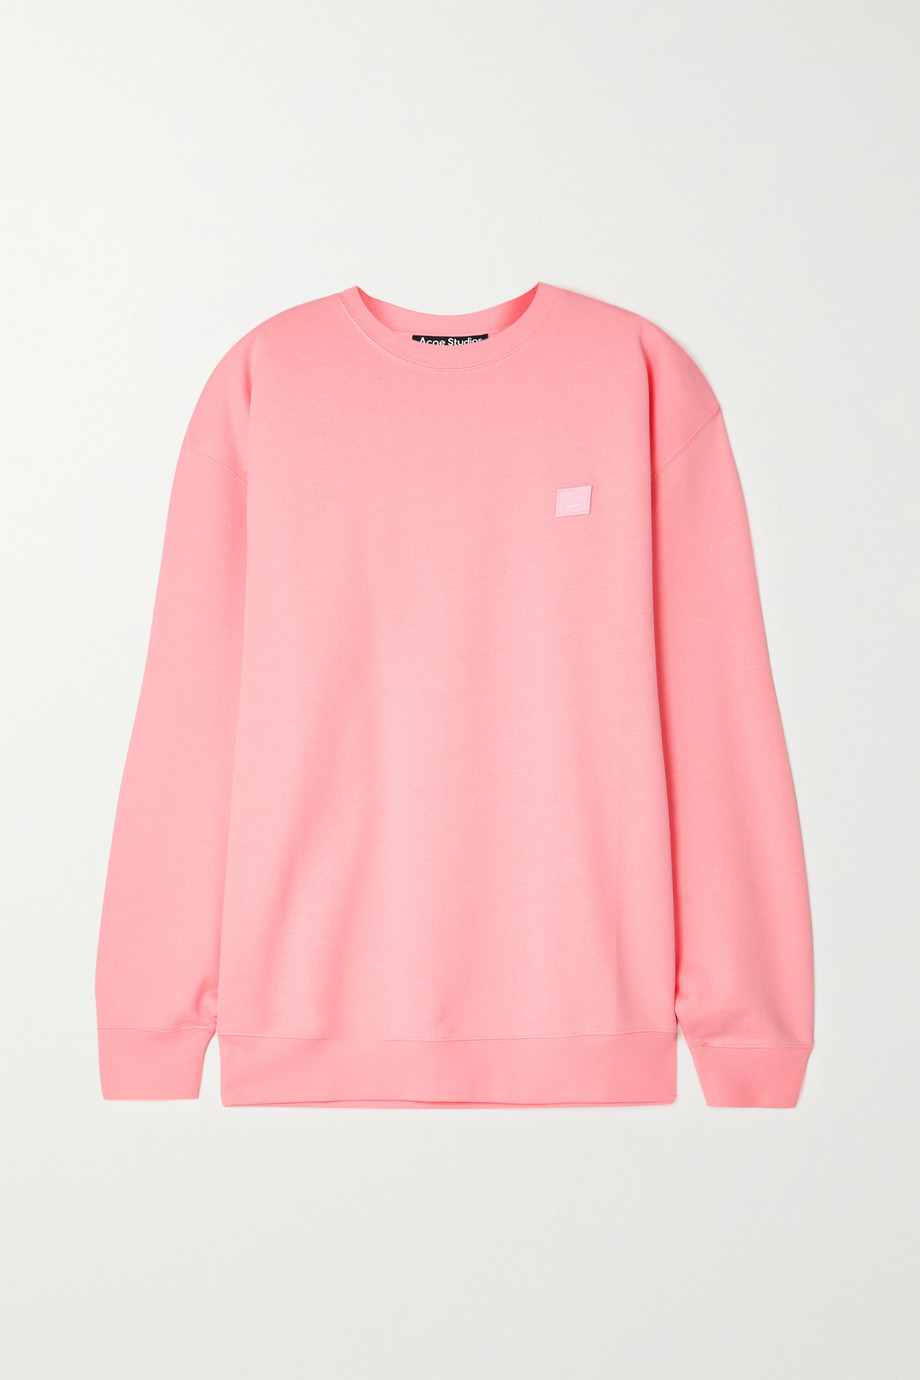 Acne Studios + NET SUSTAIN Forba Face oversized appliquéd organic cotton-jersey sweatshirt